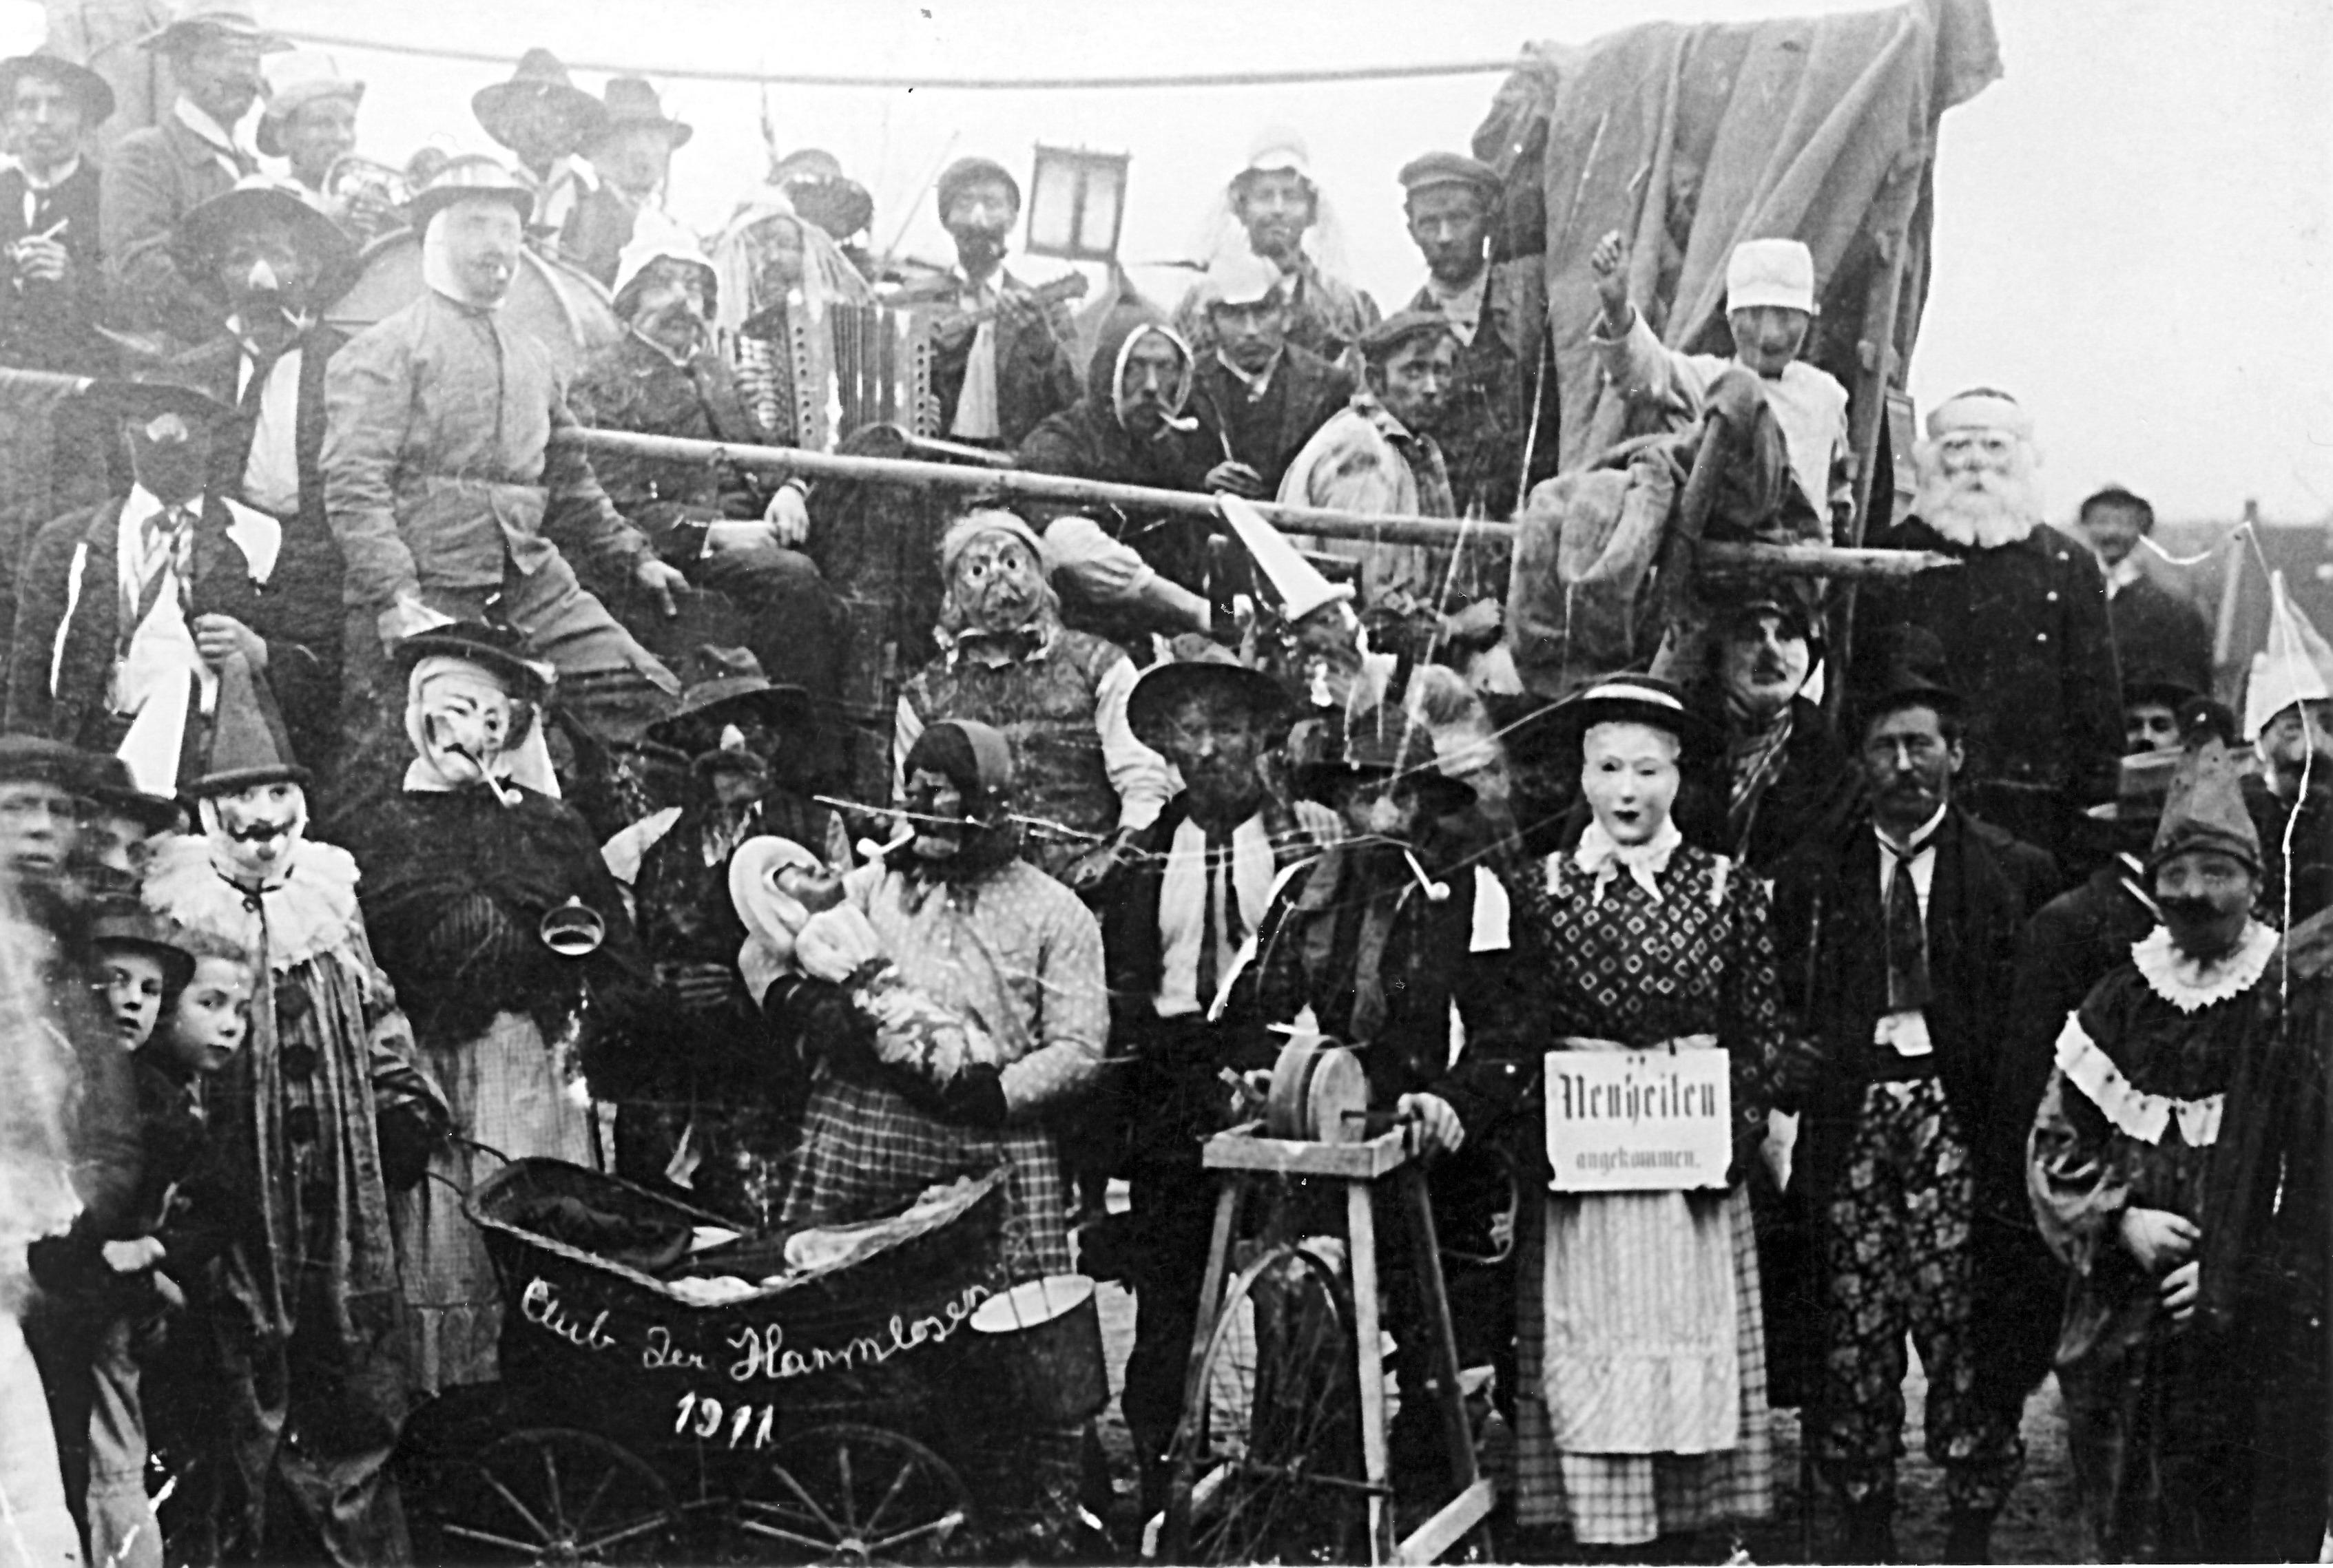 Fastnacht 1911